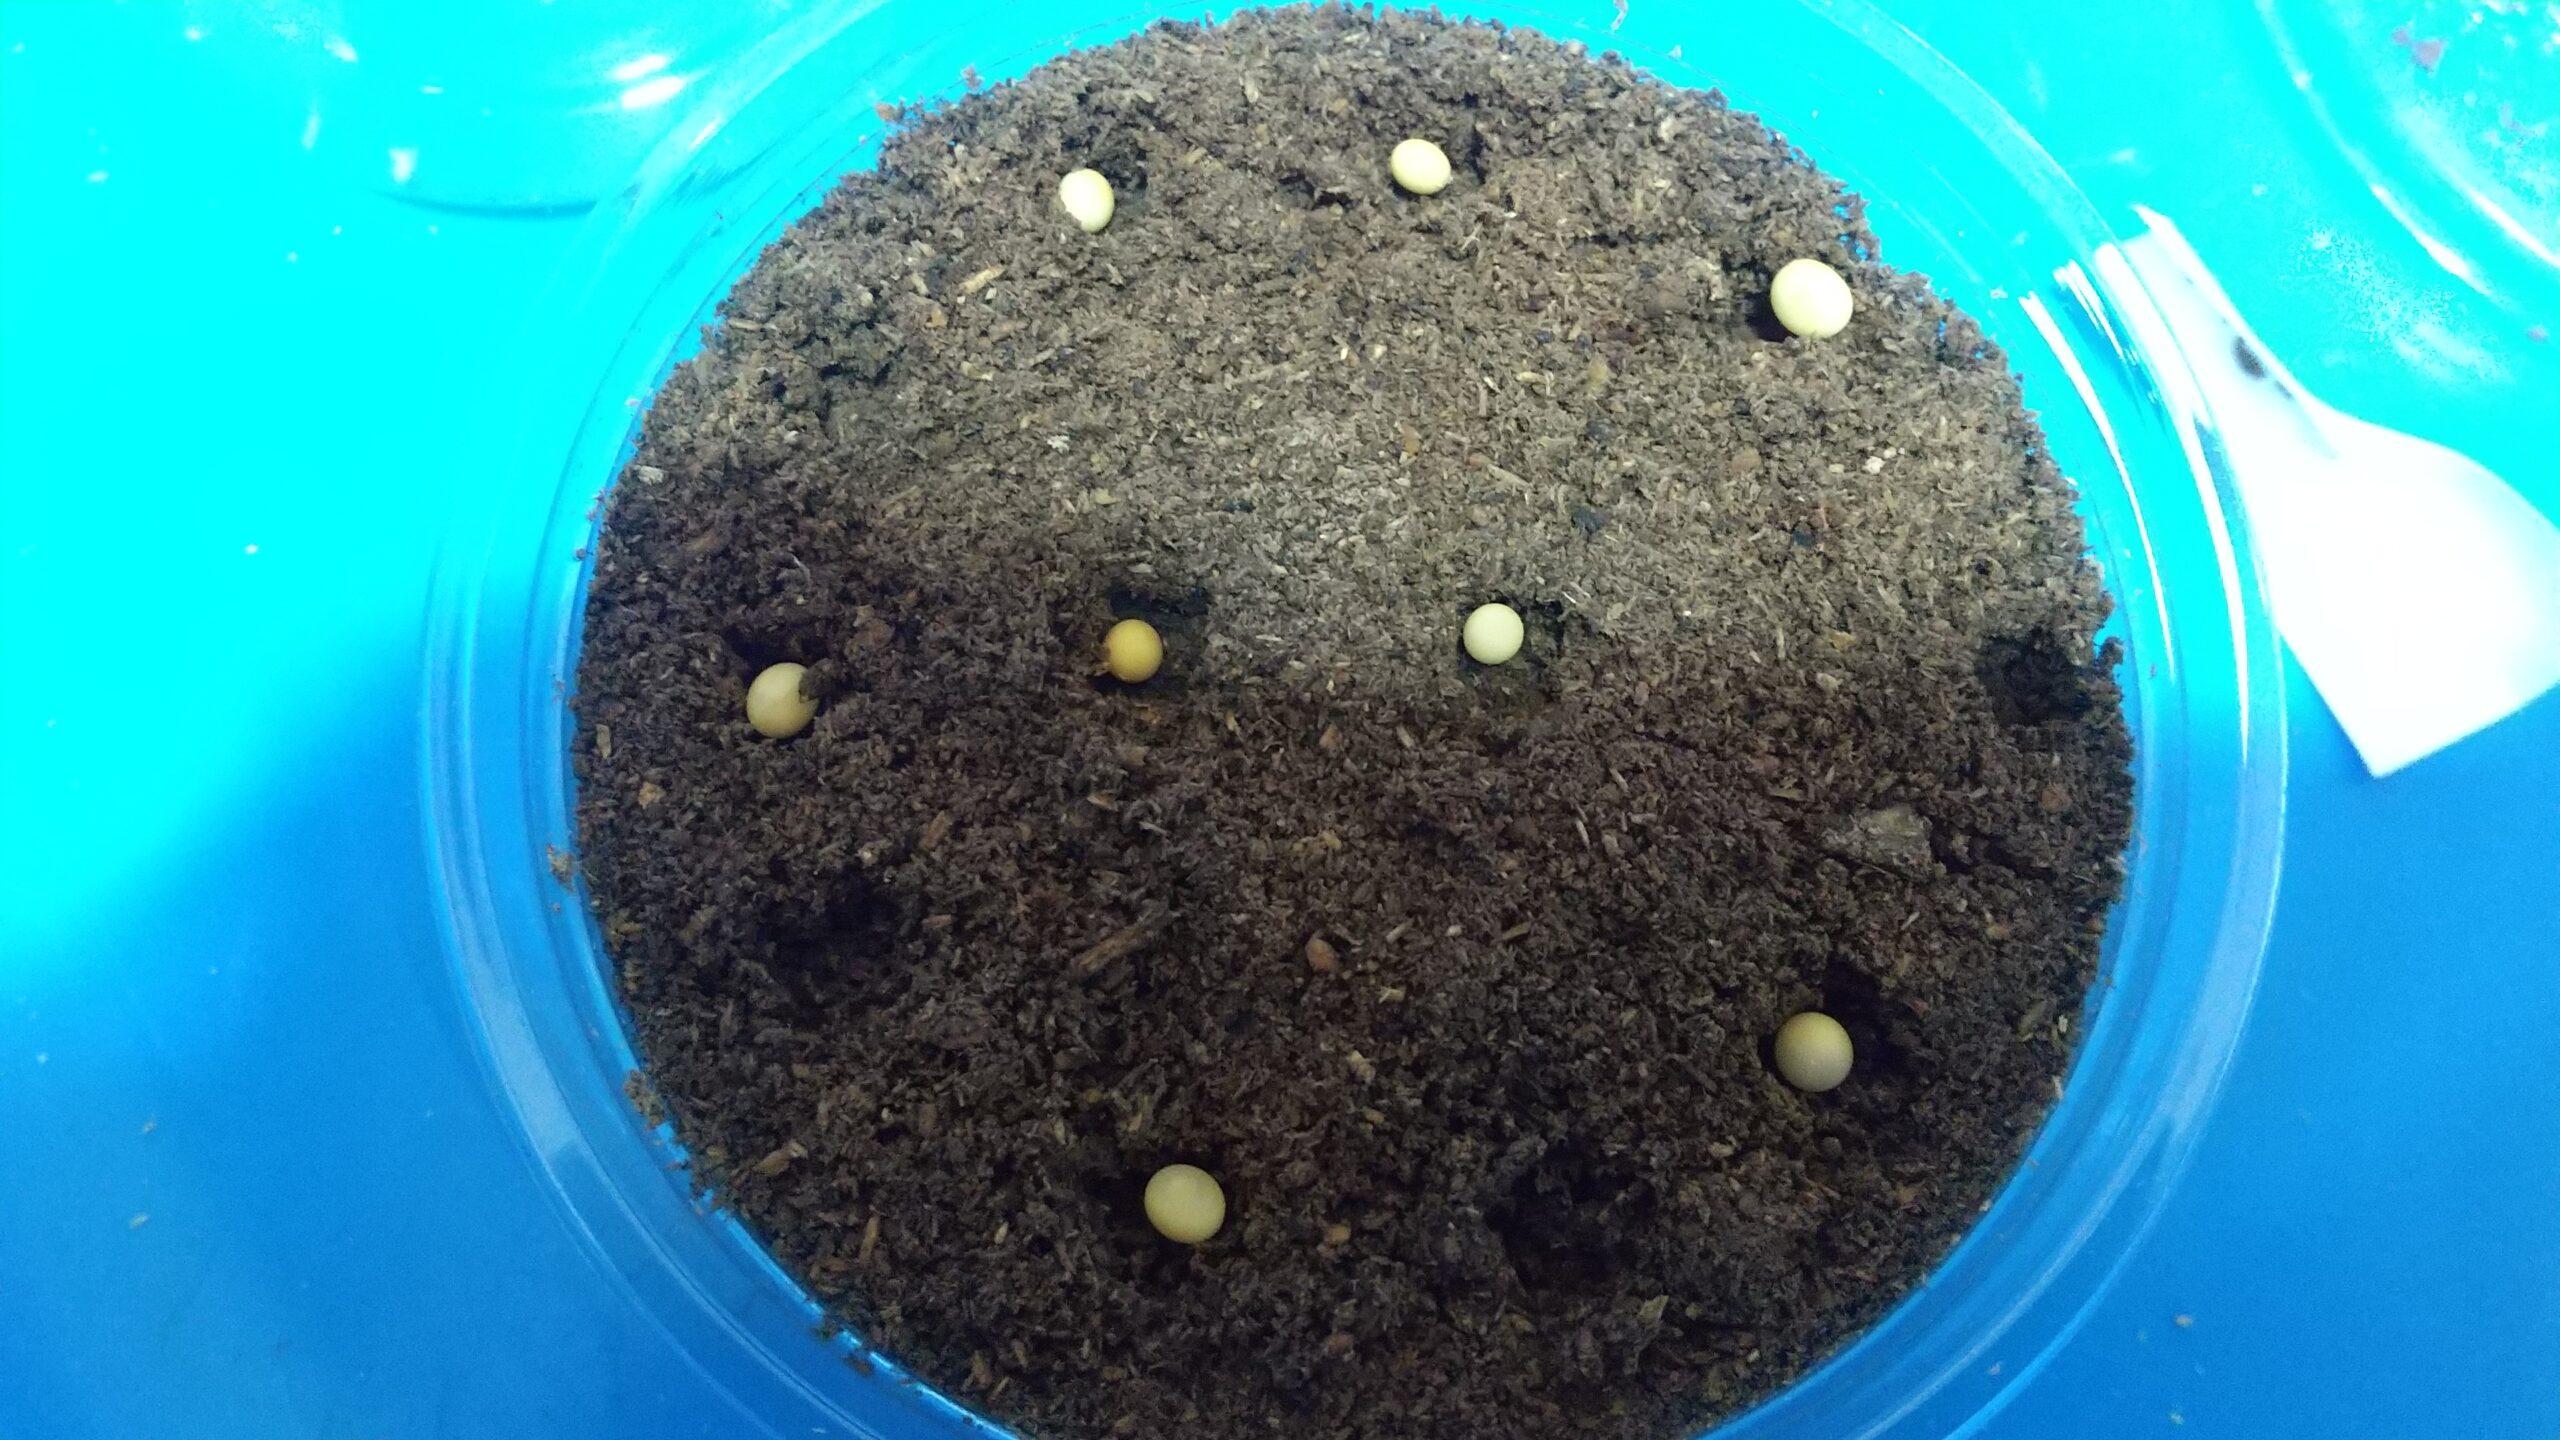 CBモーレンカンプオウゴンオニ、菌床産卵で16頭の卵・幼虫が採れた!